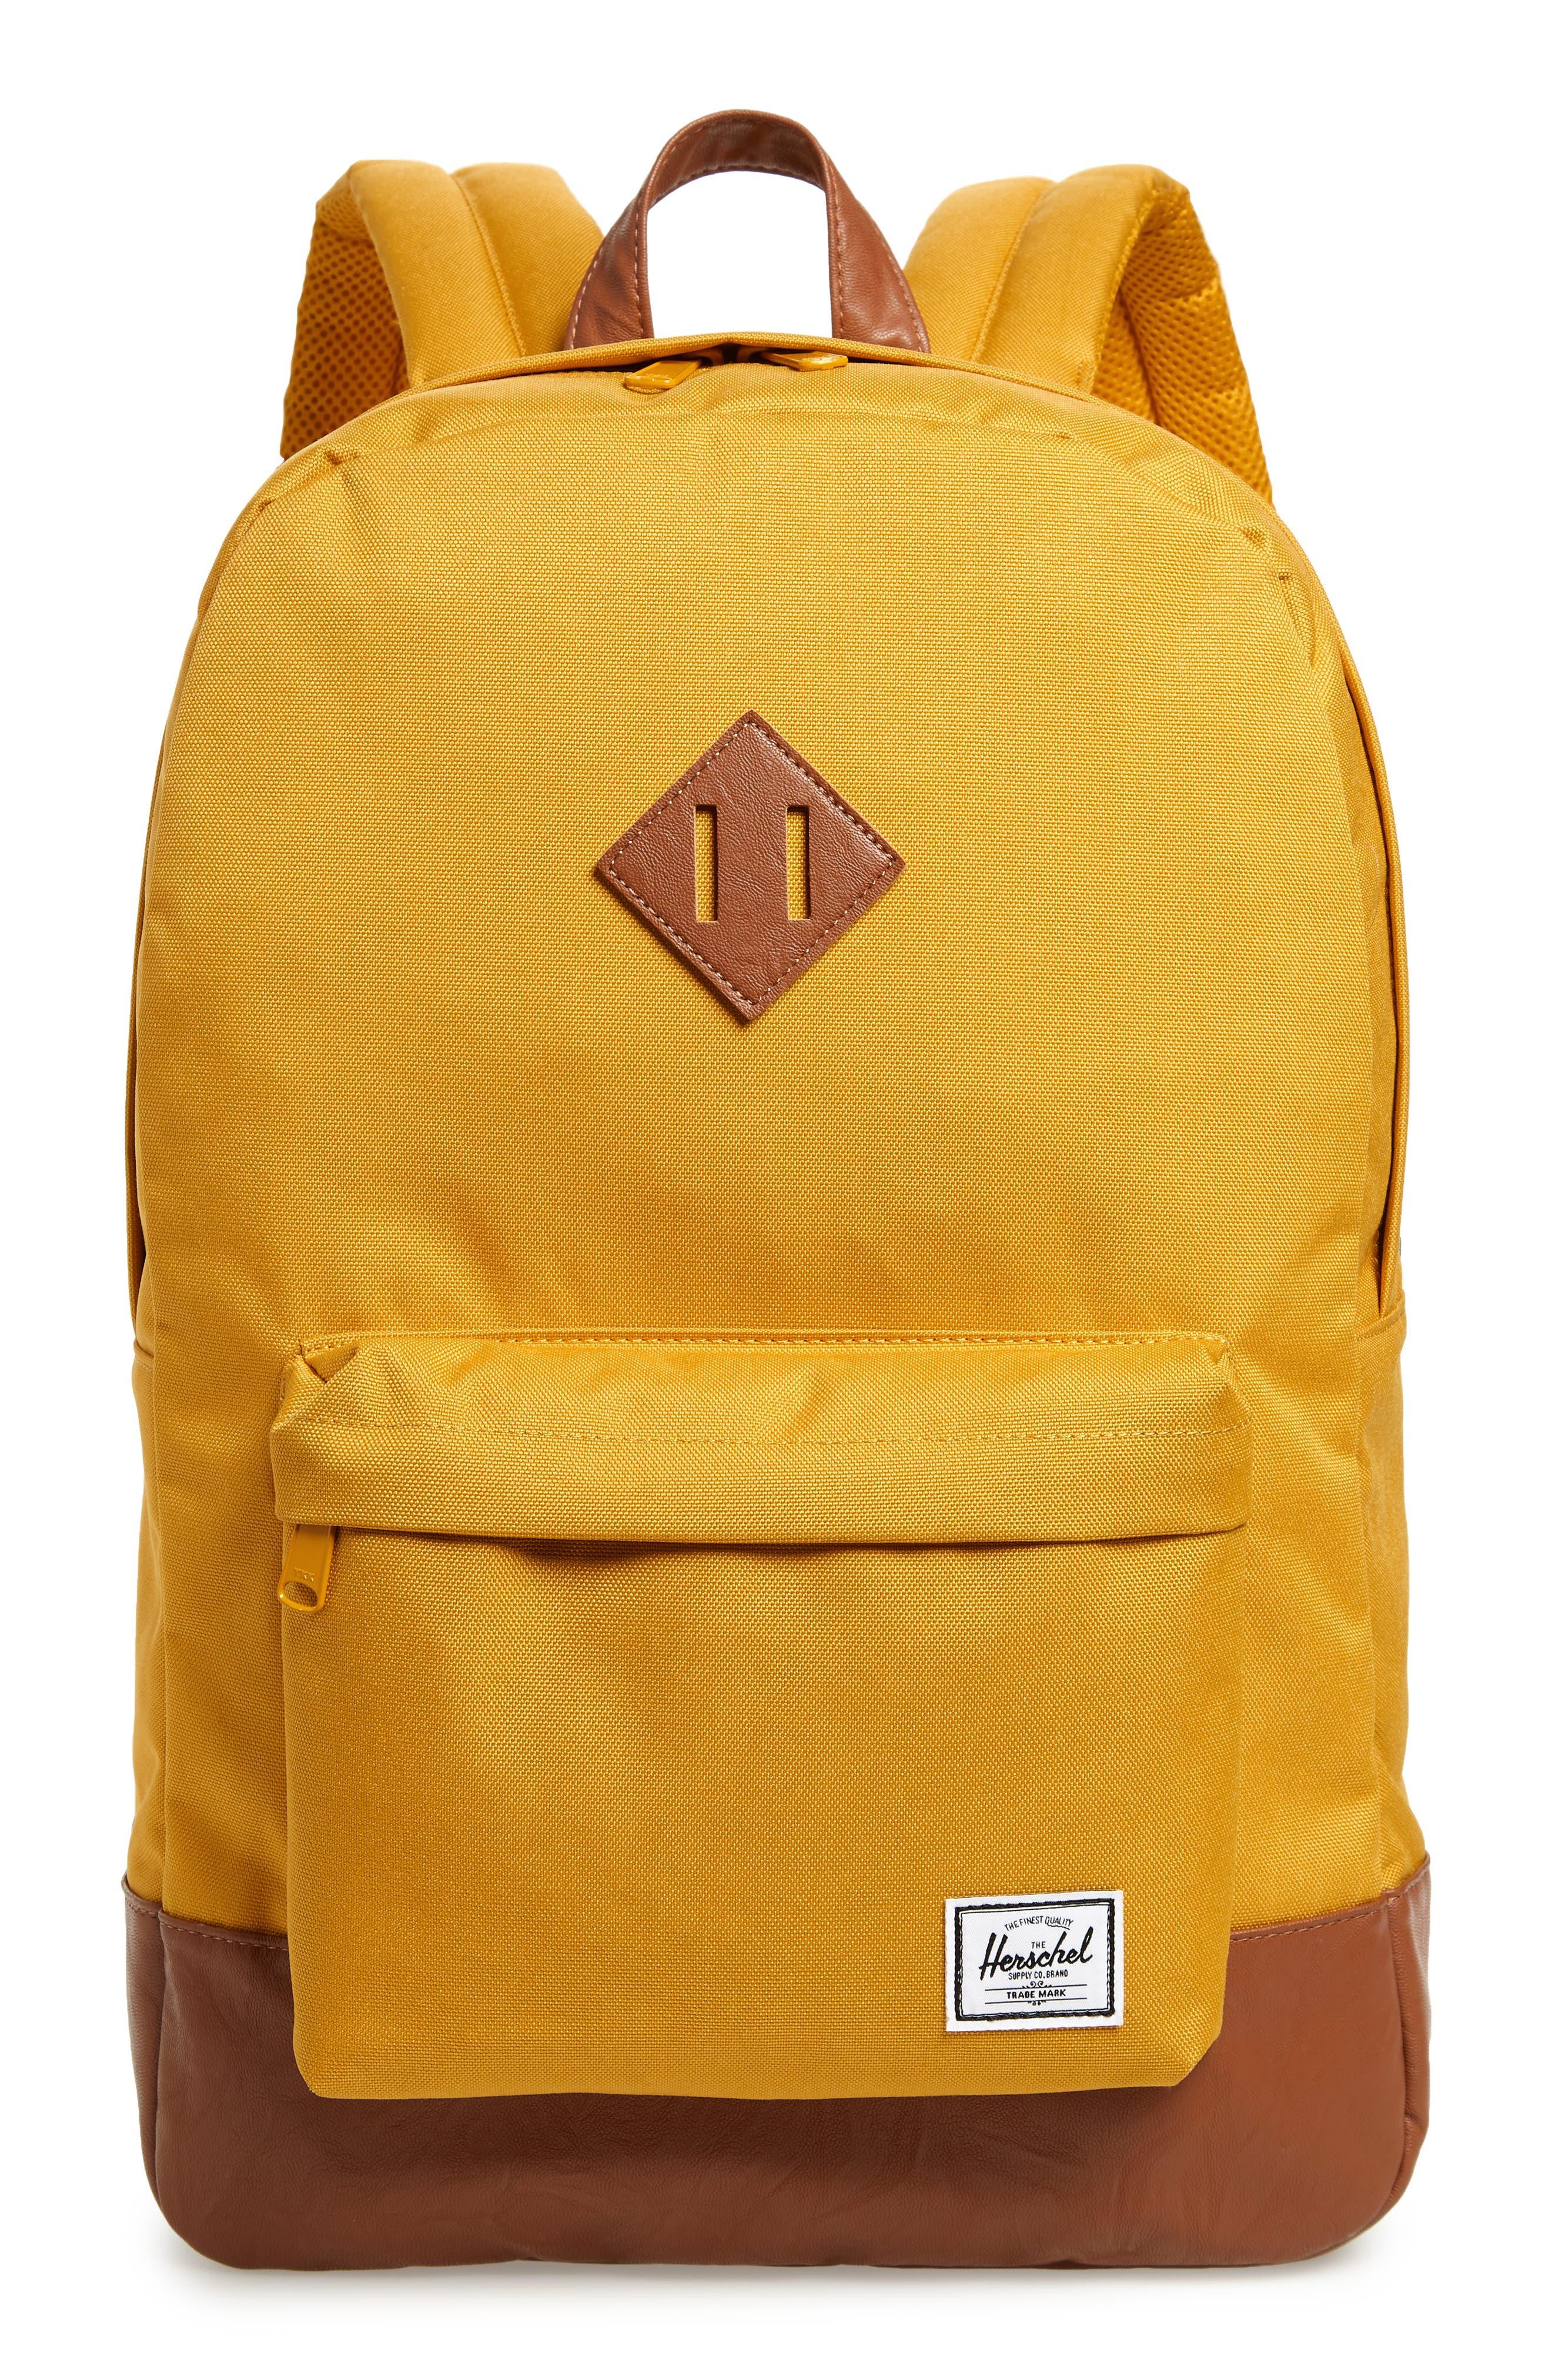 Heritage Backpack,                             Main thumbnail 1, color,                             ARROW WOOD